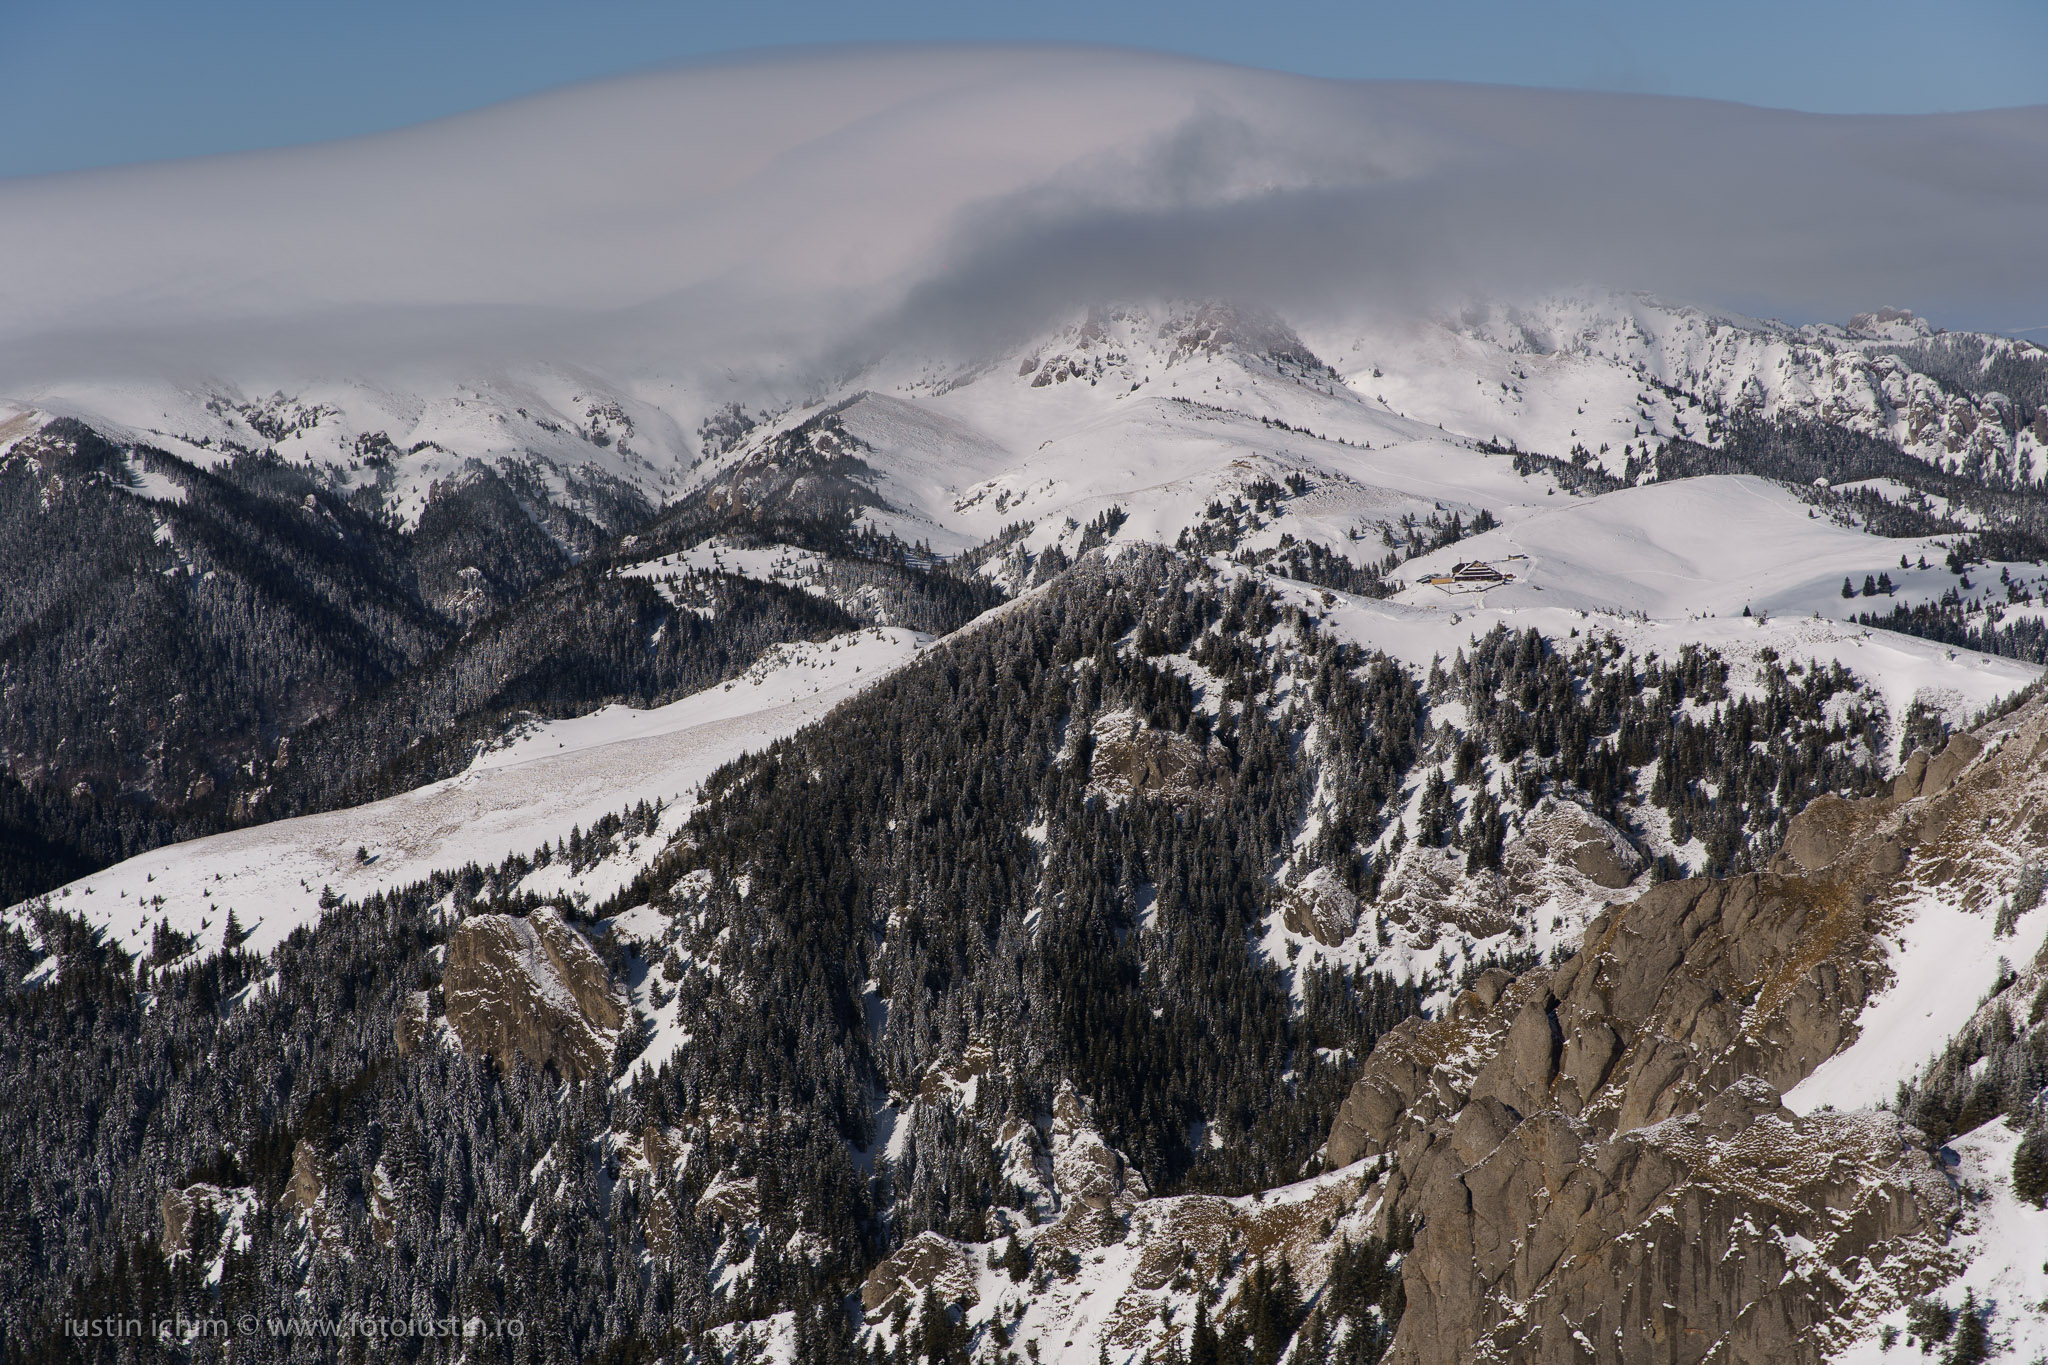 Munții Ciucaș, Vf. Ciucaș